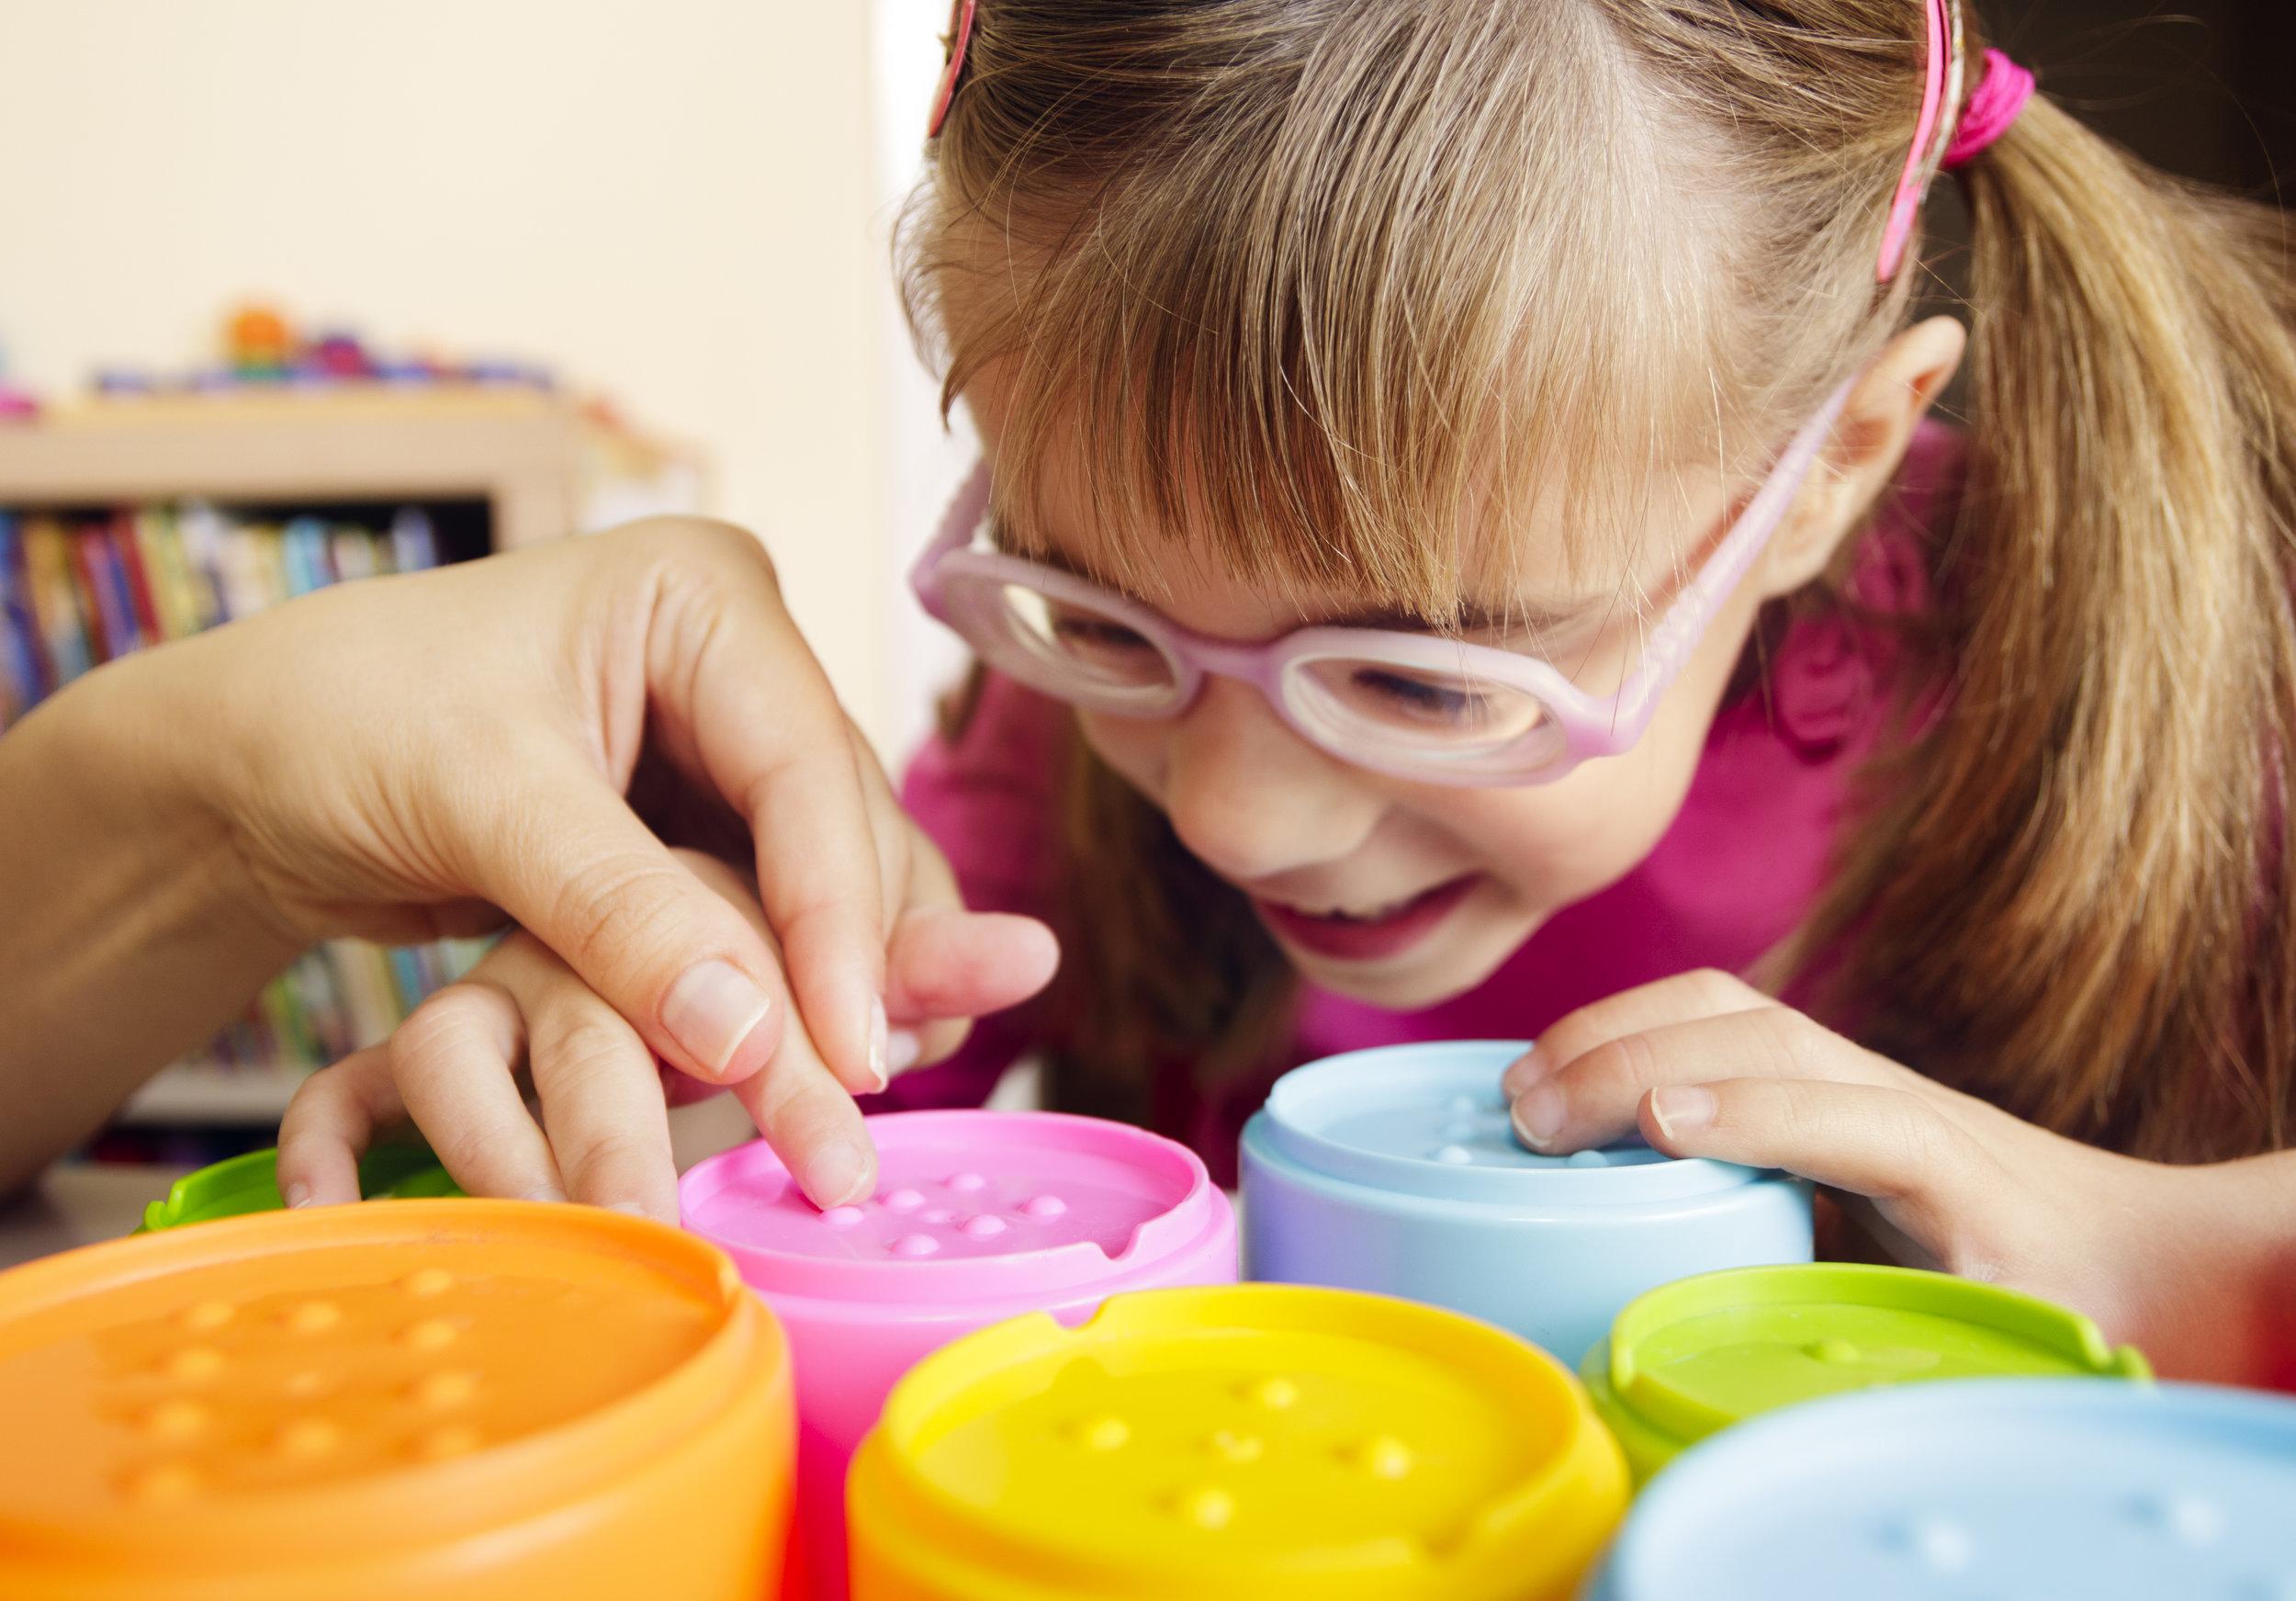 16 Best Sensory Toys for Kids That'll Ignite Their Senses